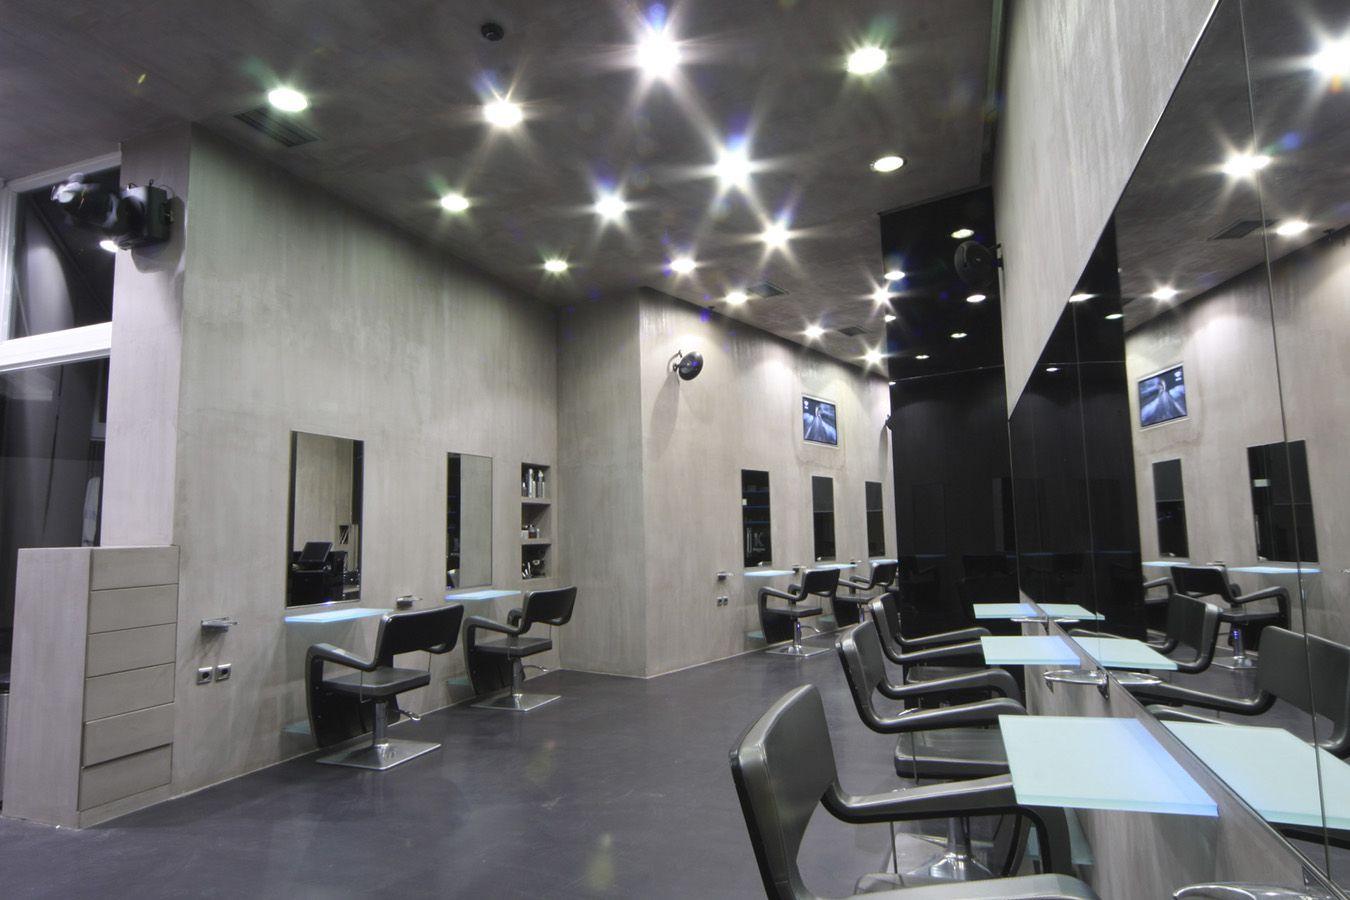 Salon - Slide 1